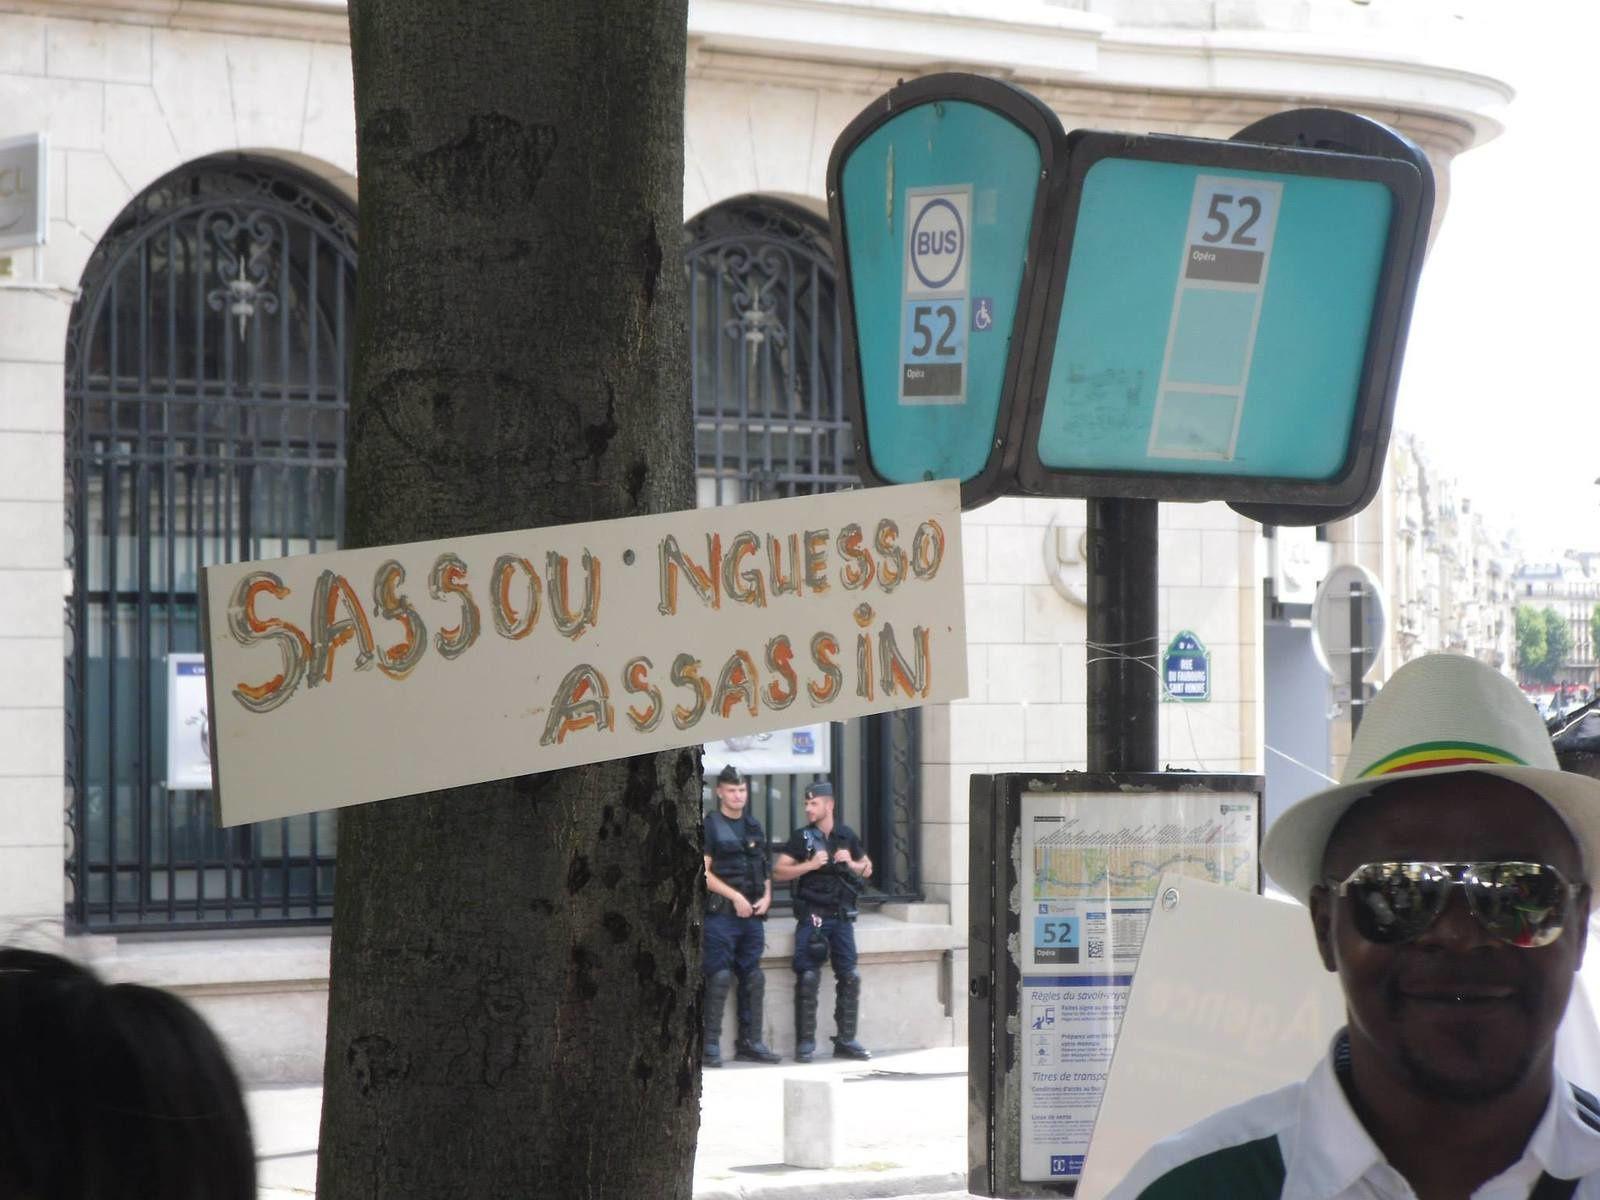 Rencontre hollande sassou nguesso